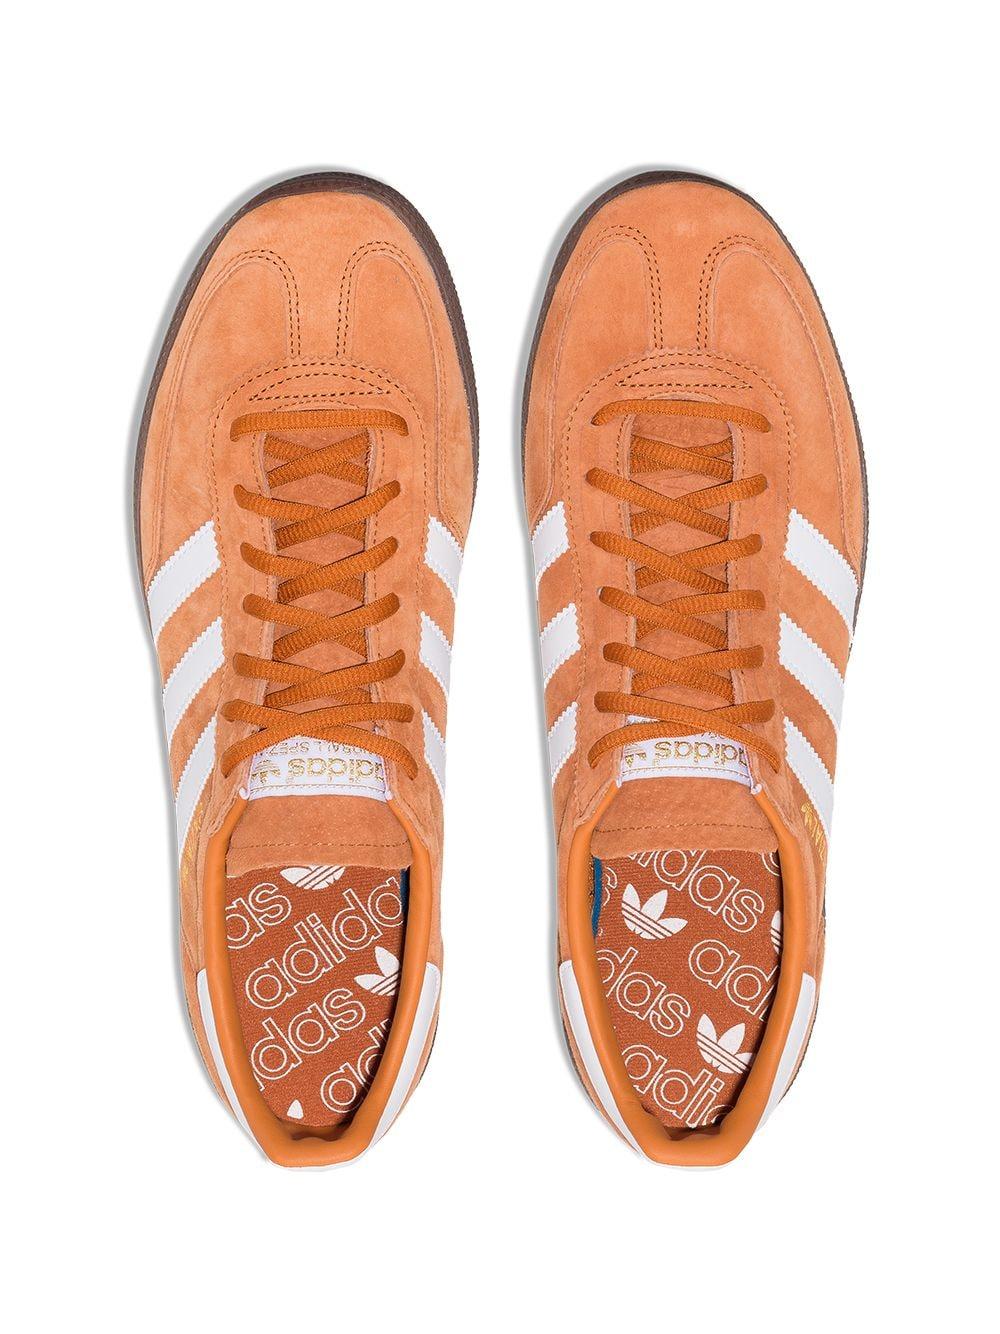 adidas gazelle handball